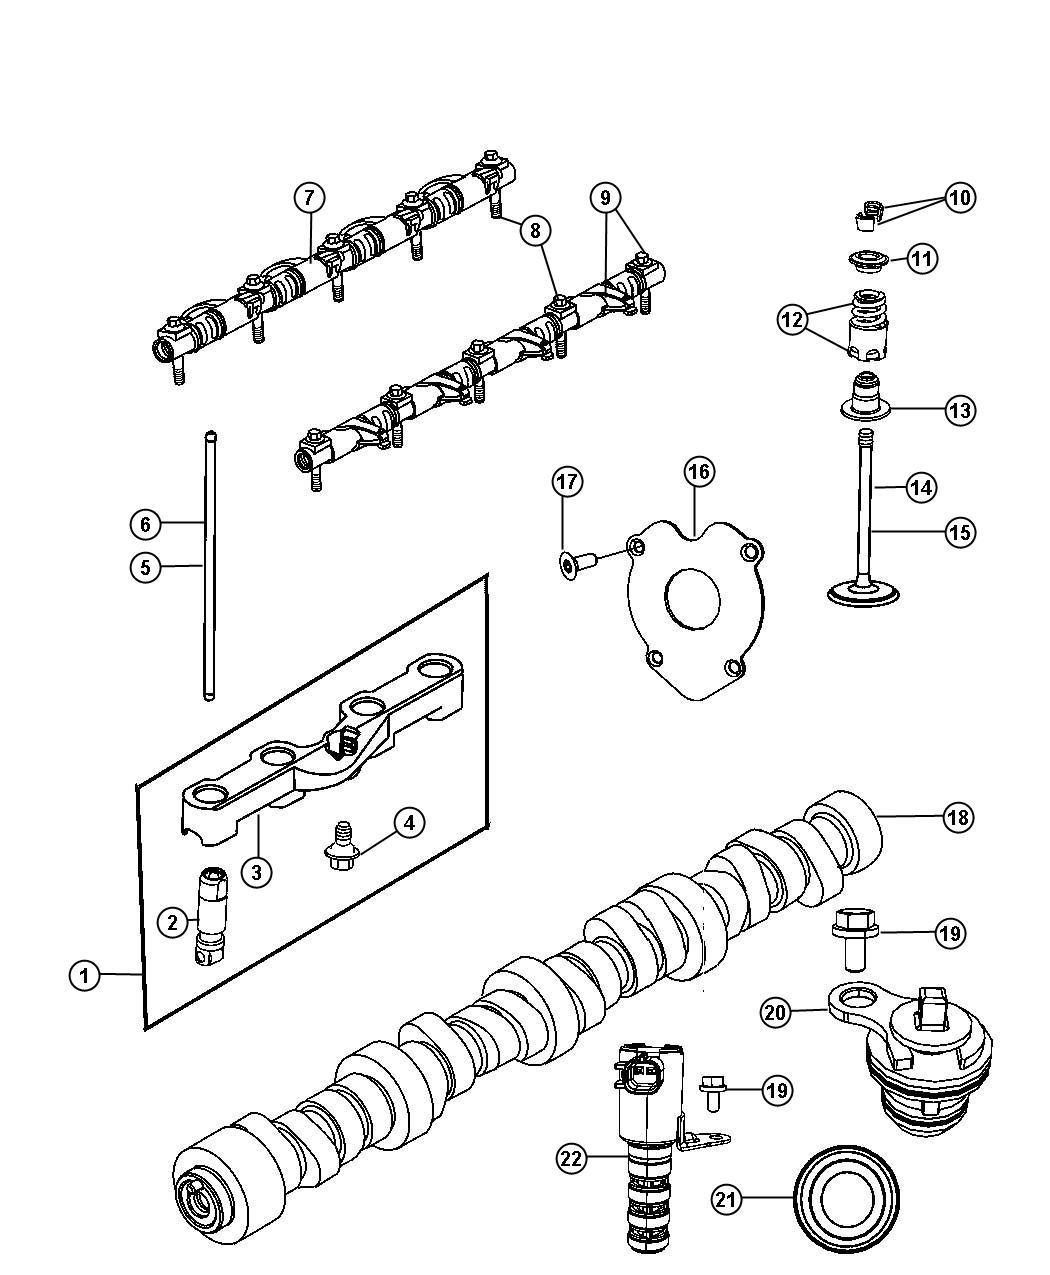 Ram 2500 Camshaft. Engine. Valvetrain, ezc, cng